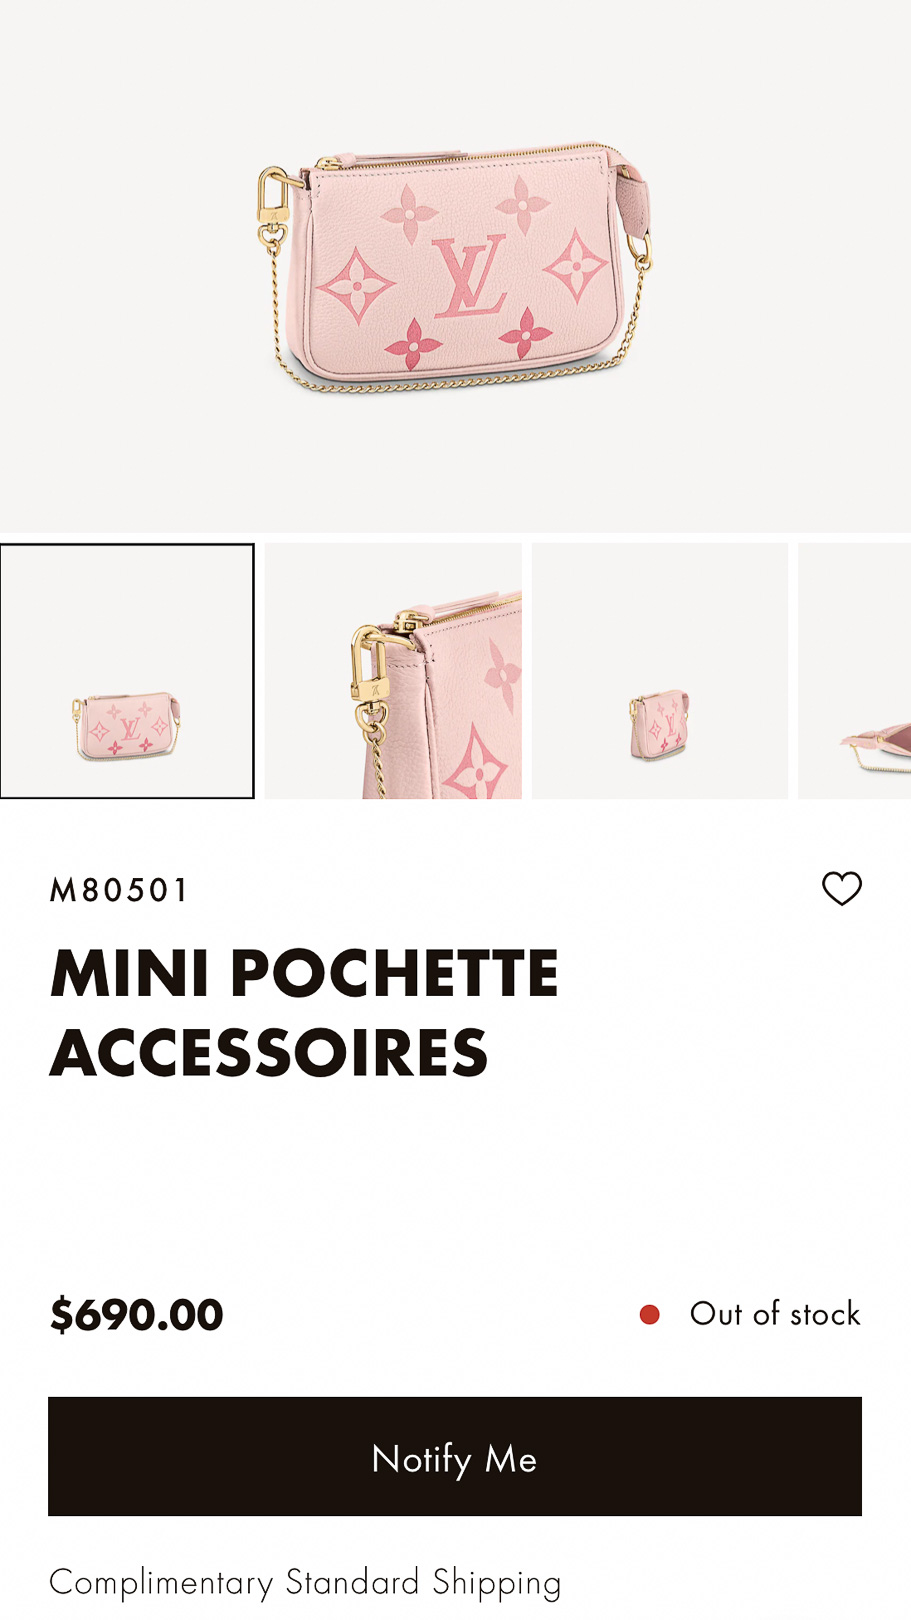 Louis Vuitton By The Pool Mini Pochette Online Price